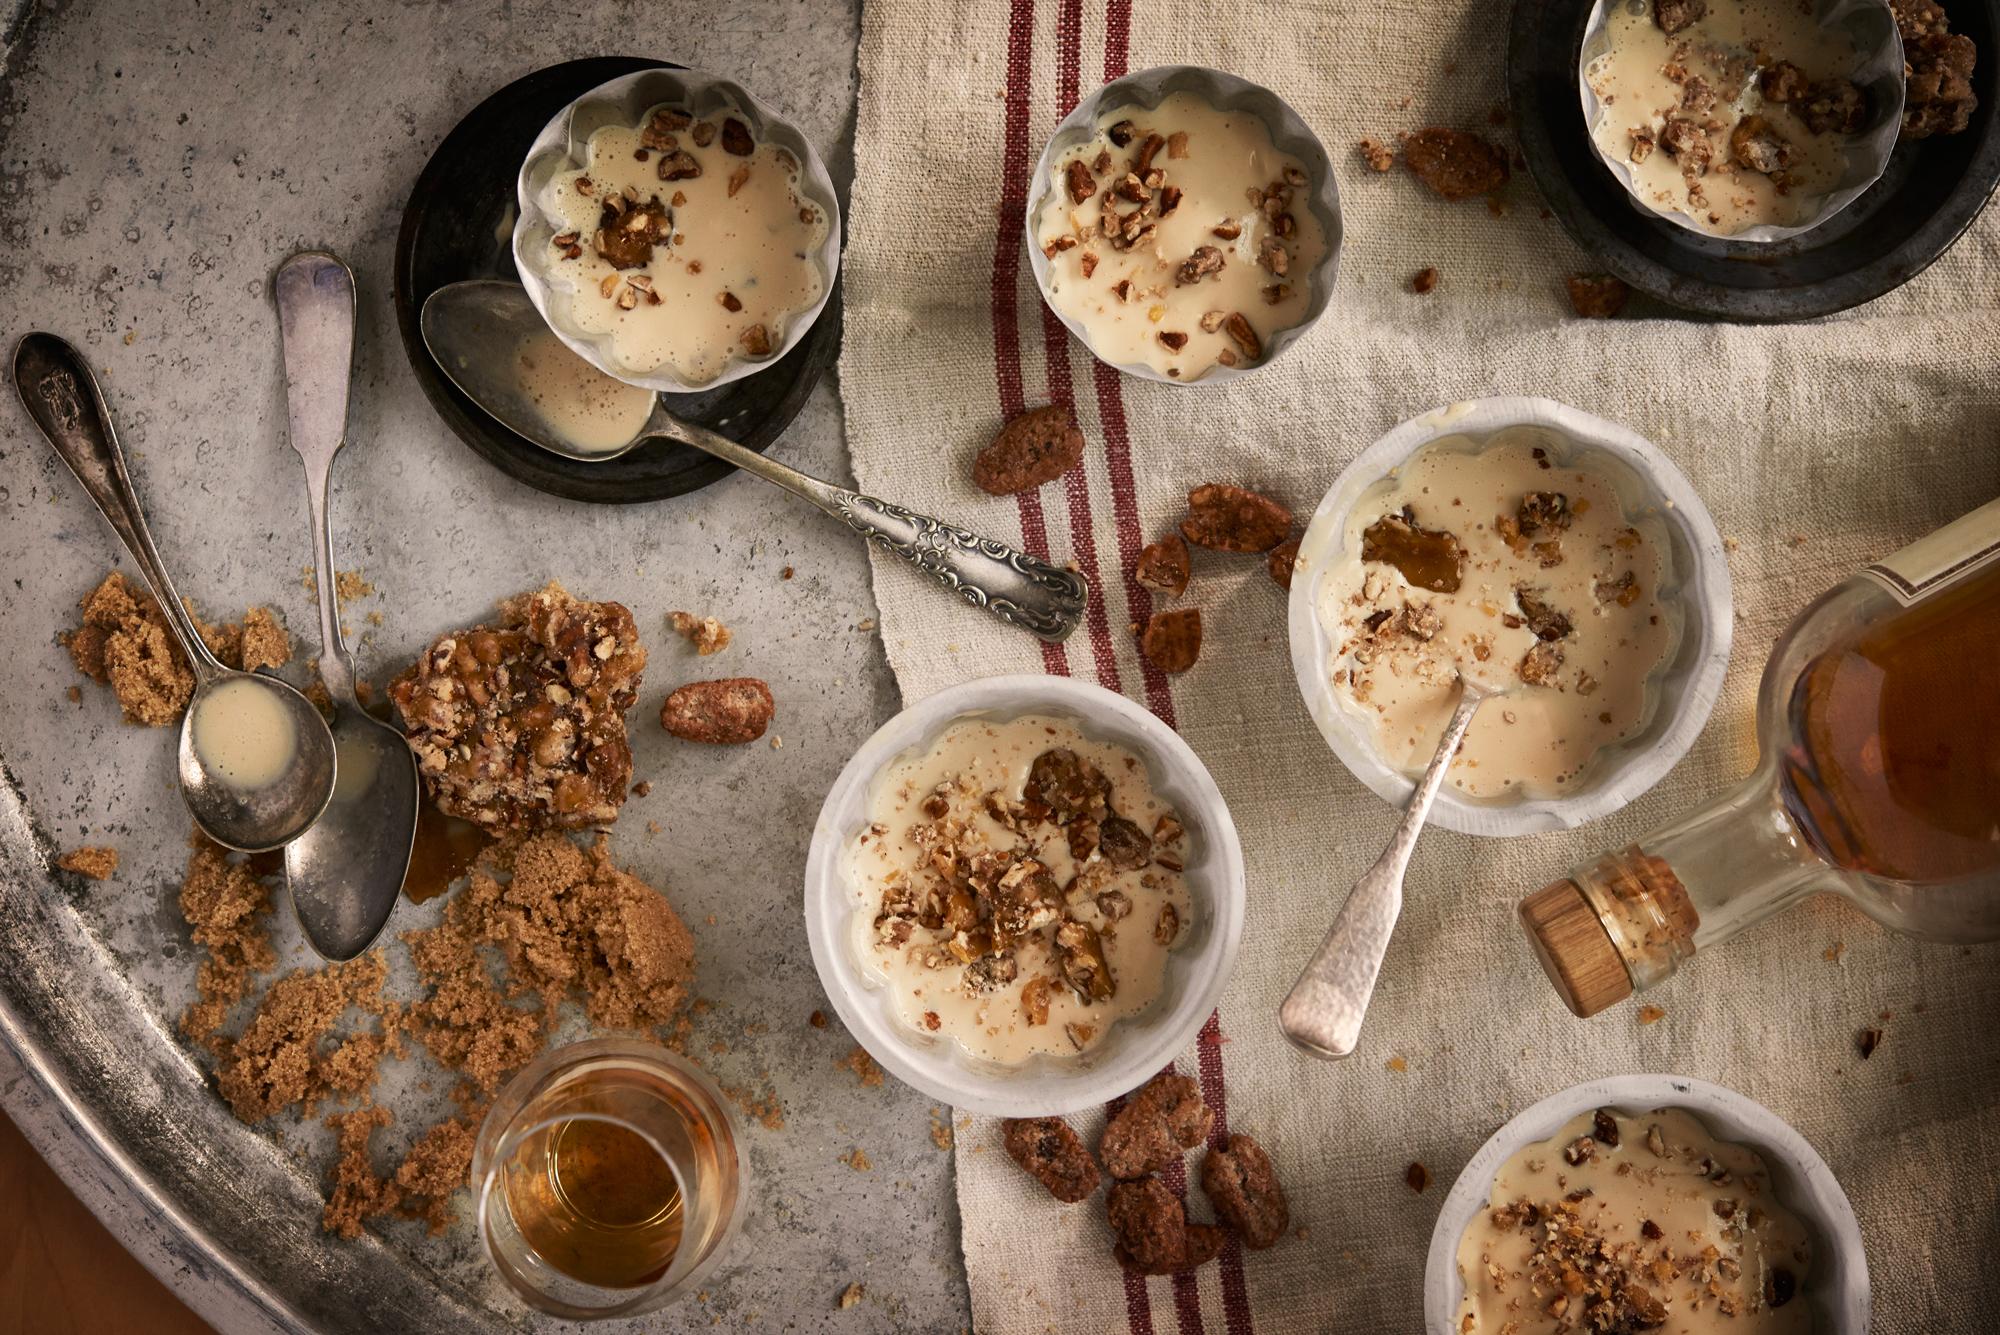 maple bourbon ice cream on table